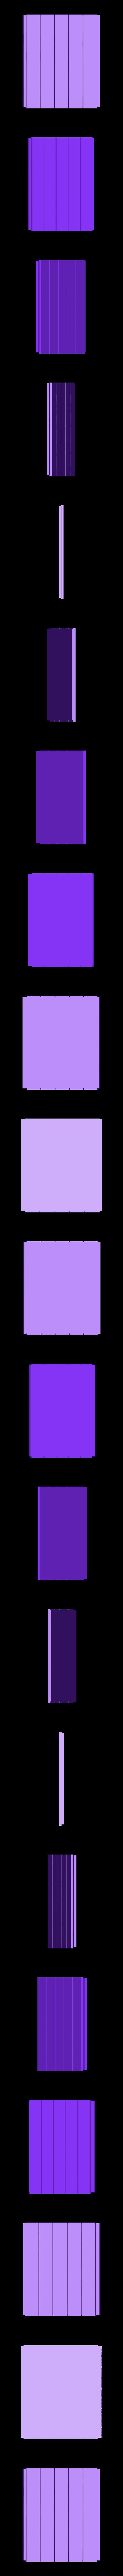 cart_floor1.stl Download free STL file Saxon Rustic Cart • 3D printable template, Earsling